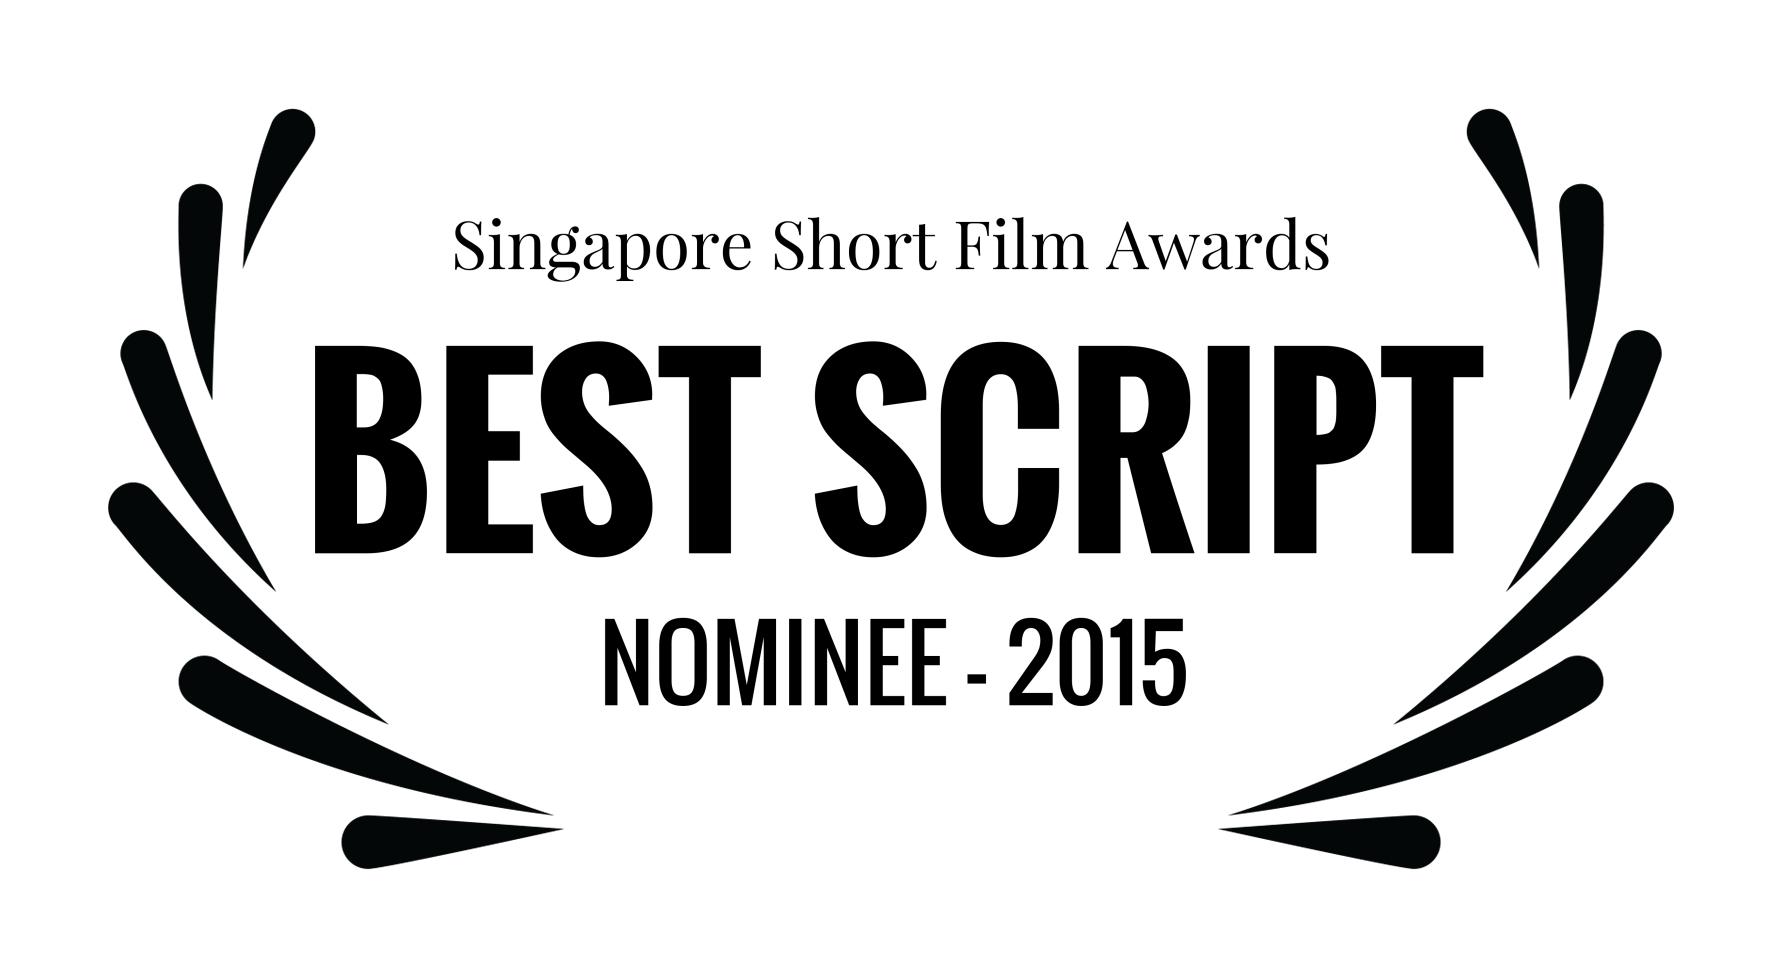 Singapore Short Film Awards - BEST SCRIPT - NOMINEE - 2015